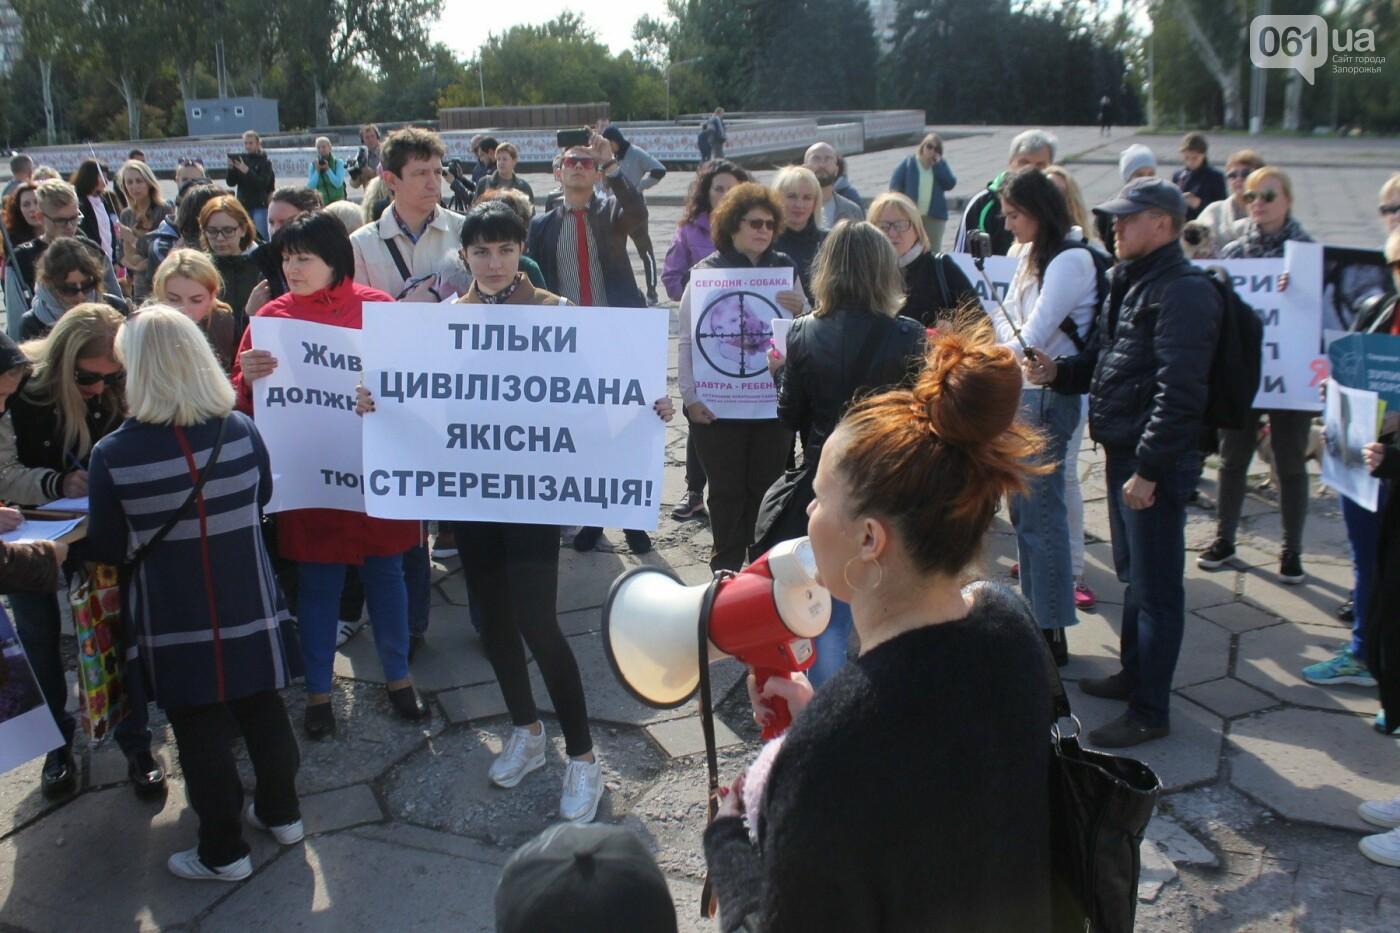 «Защити! Не мучай»: в Запорожье провели марш за права животных, – ФОТОРЕПОРТАЖ, ВИДЕО, фото-16